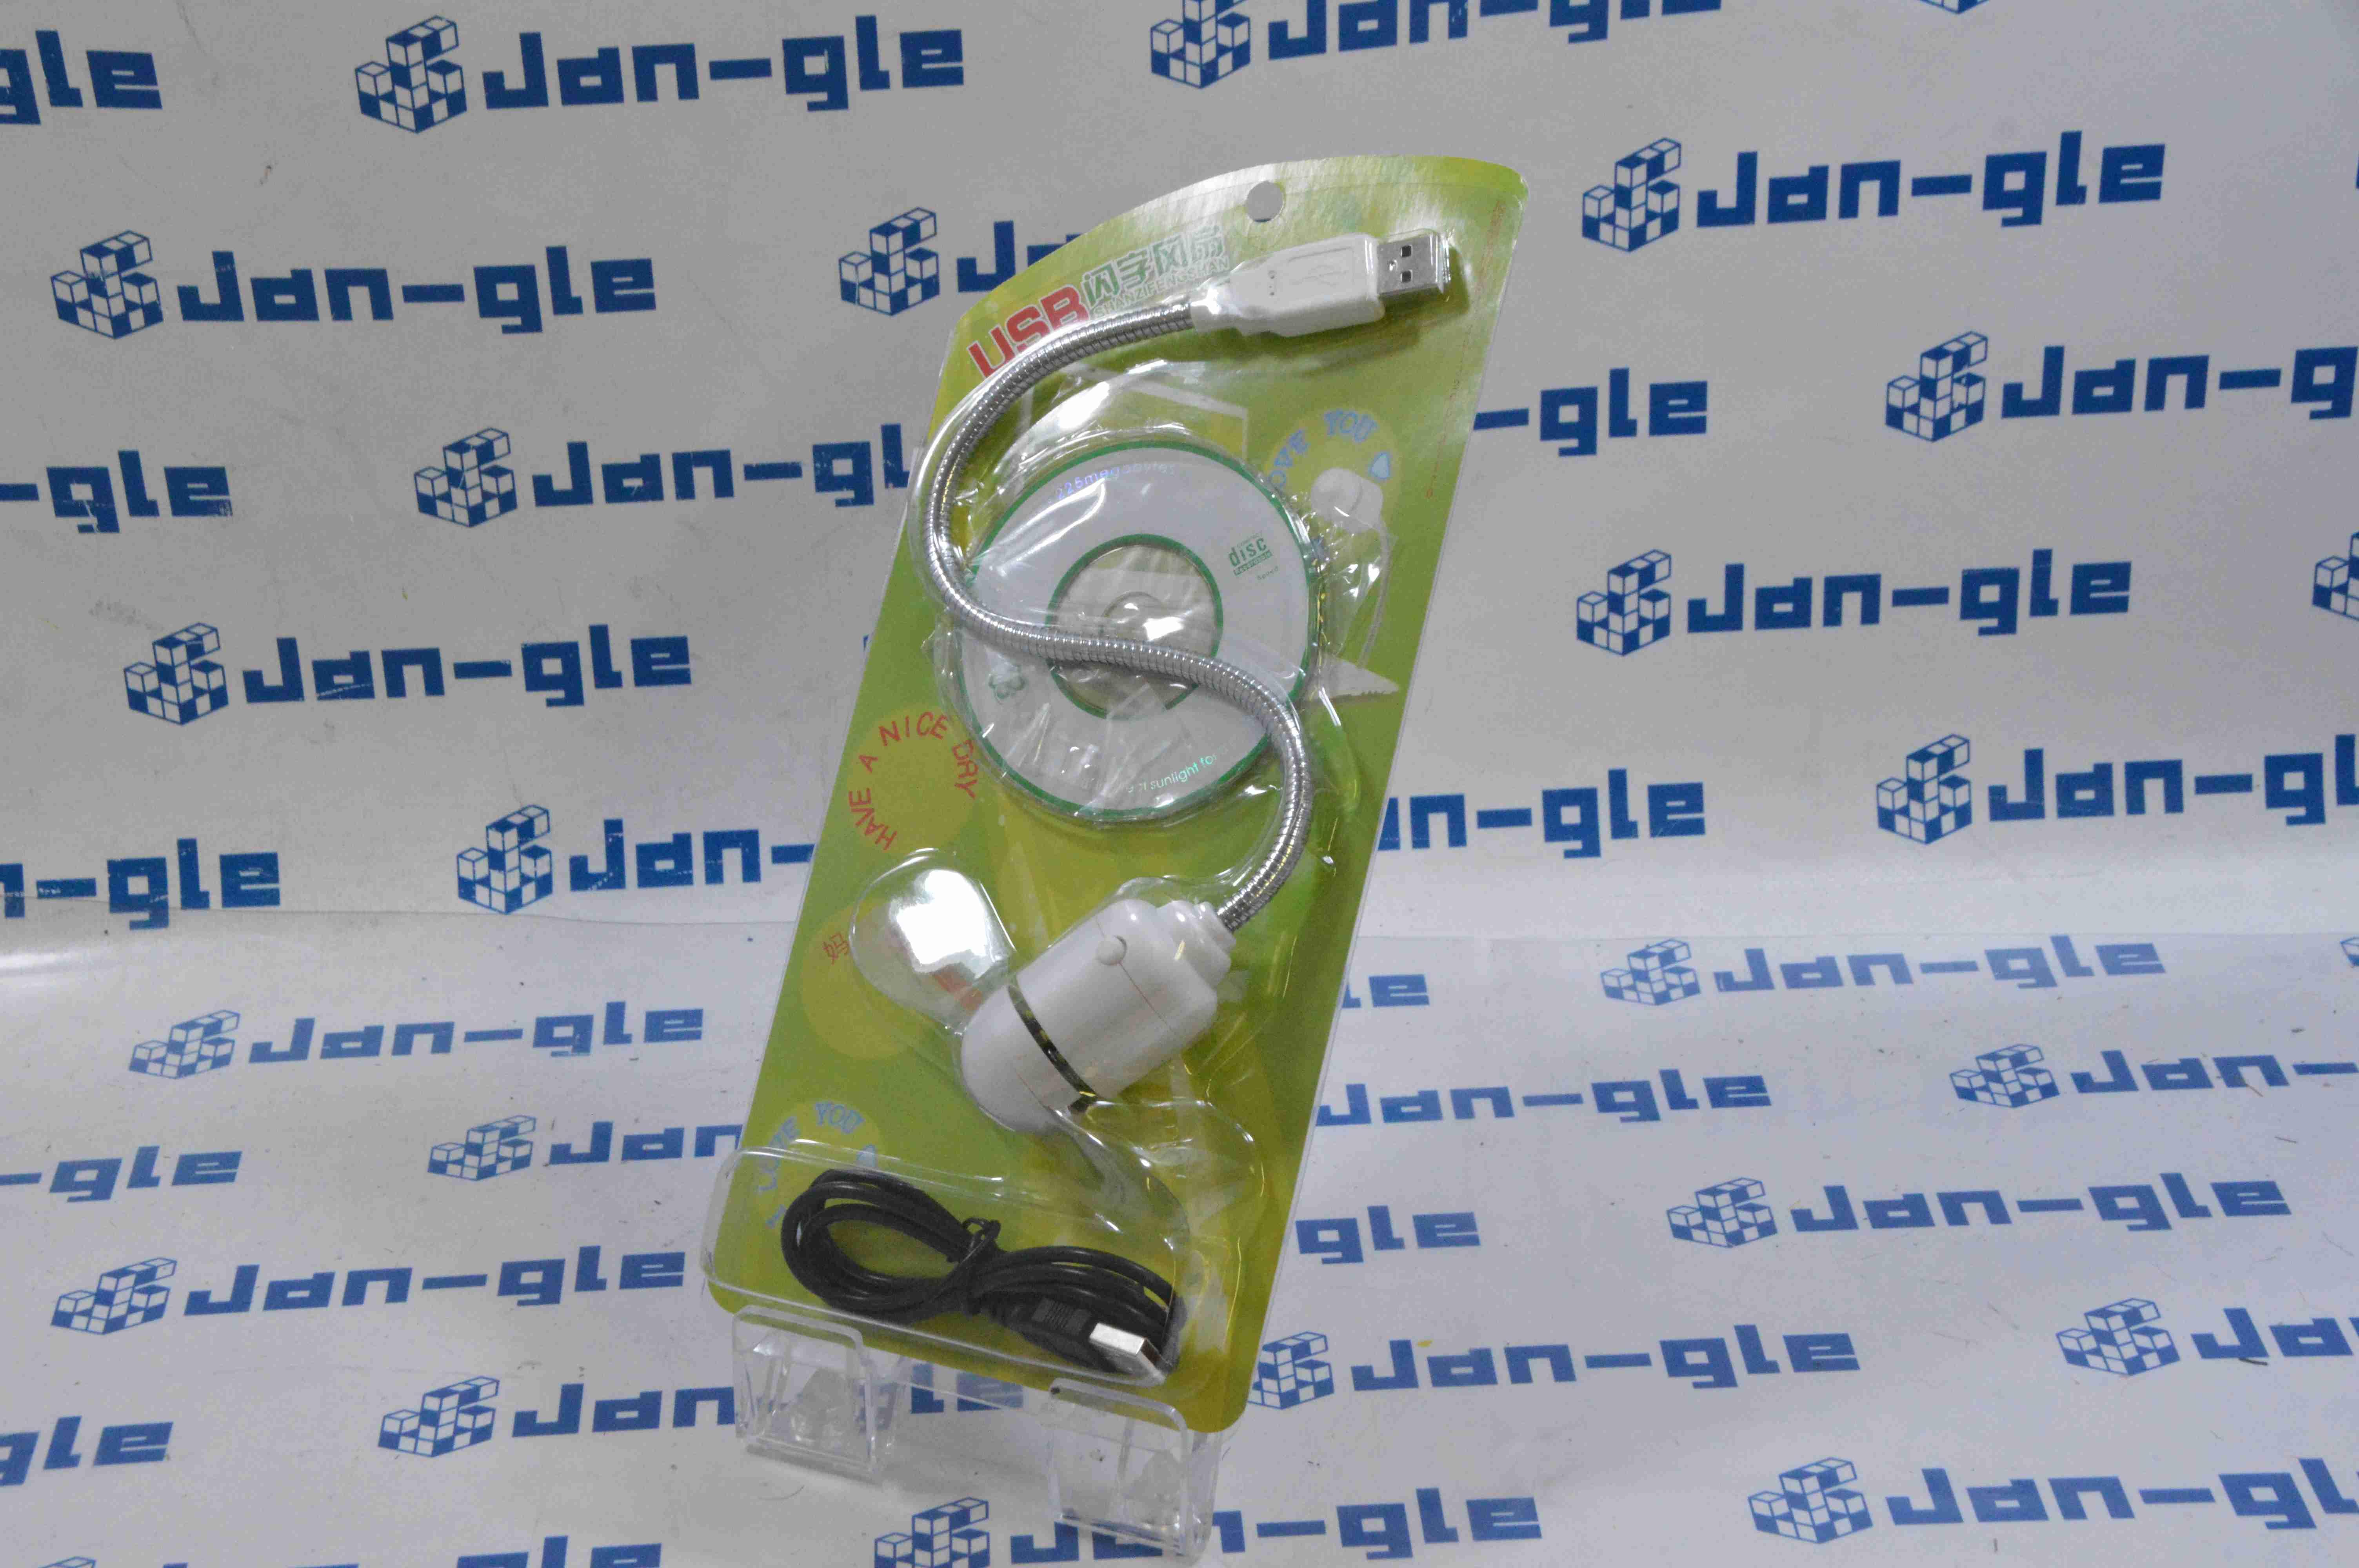 【KS】【新品】 USB SHANZIFENGSHAN 10個セット スマホアクセサリー